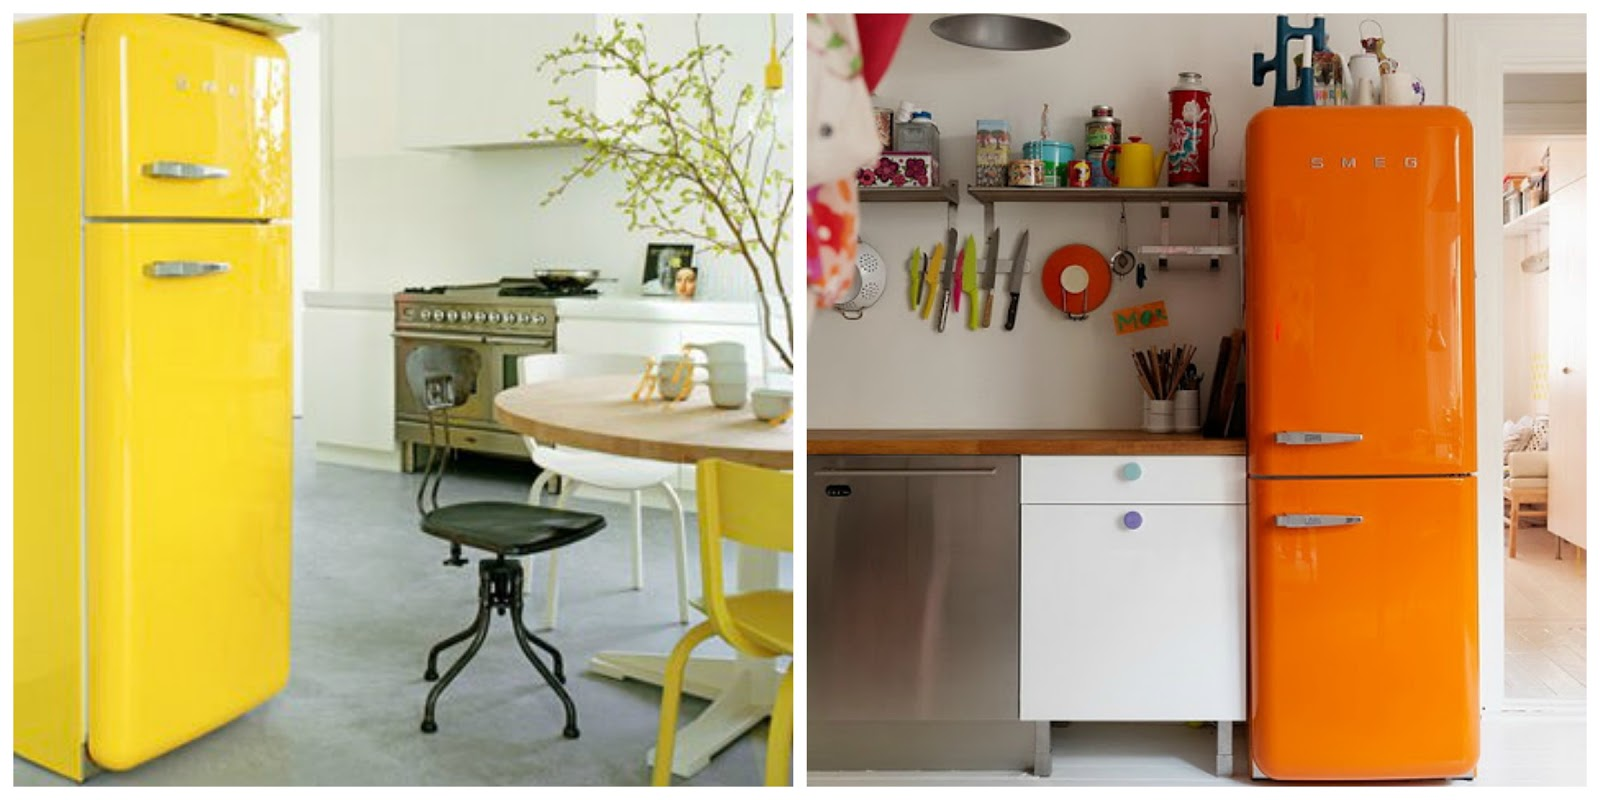 Chic deco smeg fridge piensa en chic - Cocinas retro vintage ...